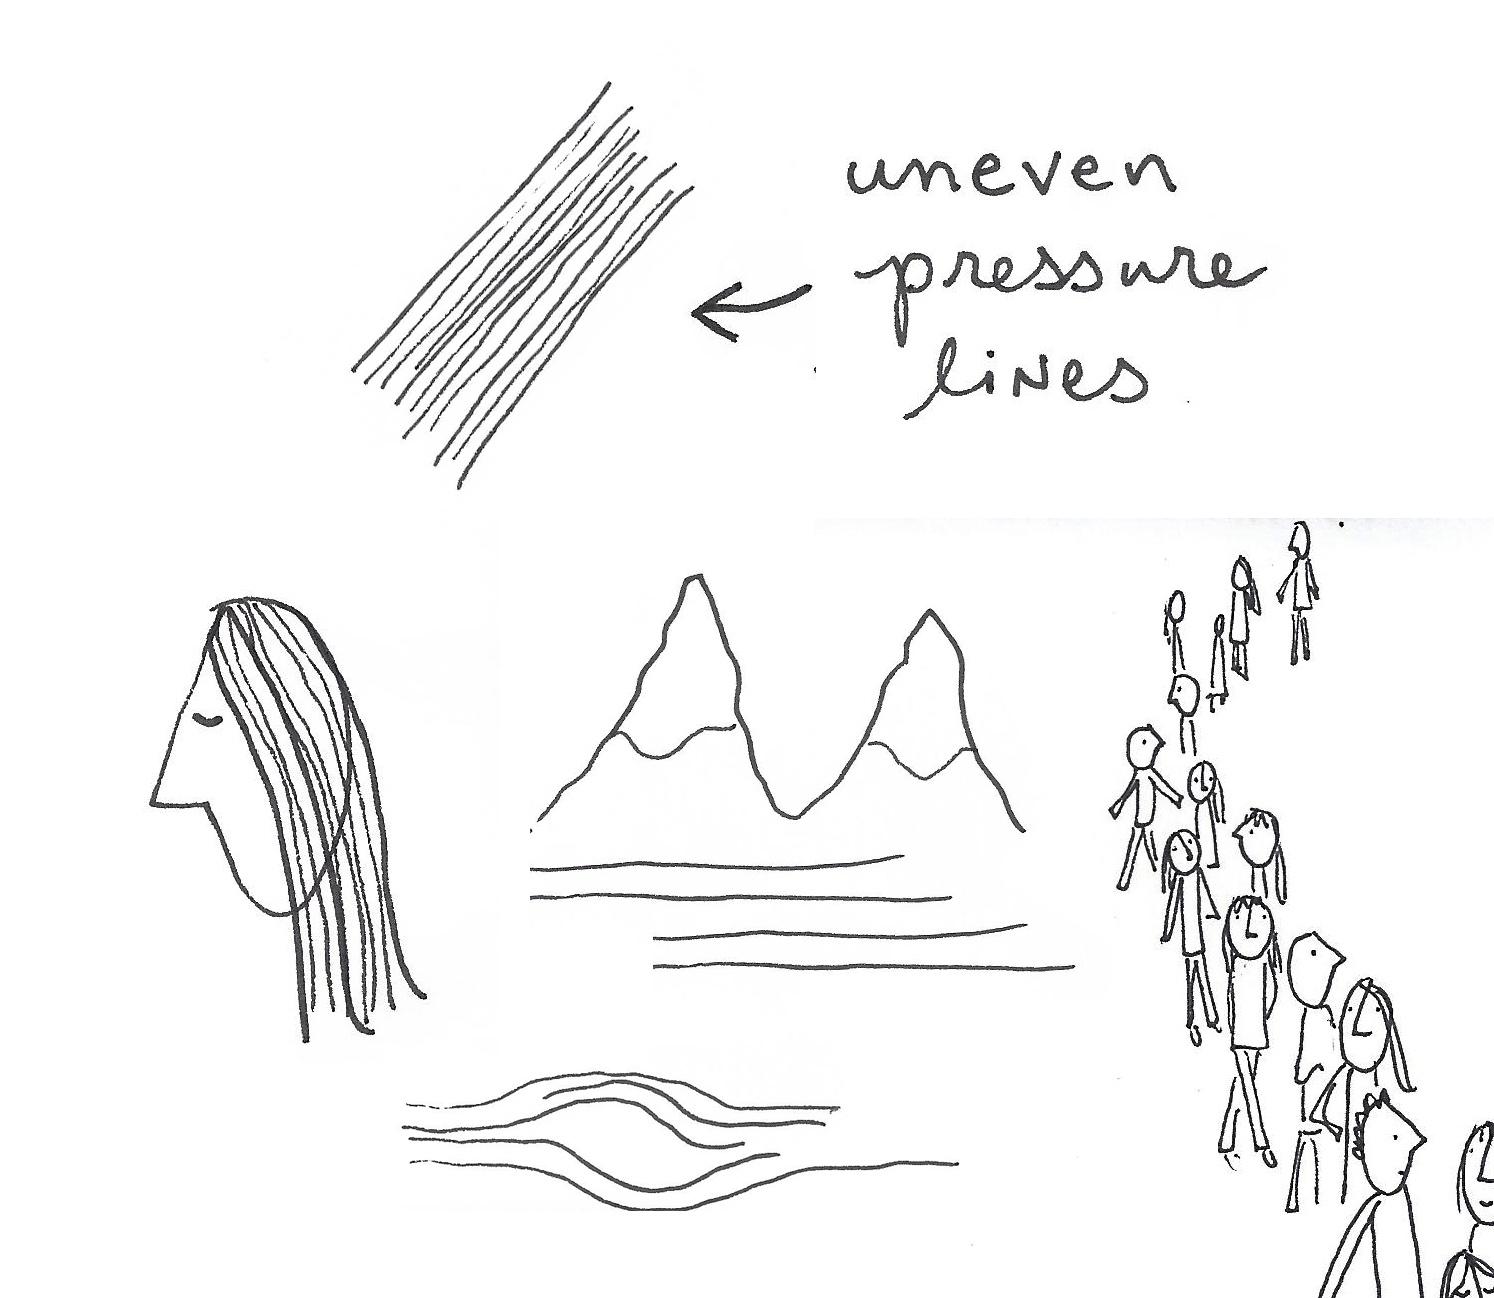 Uneven pressure lines for variation